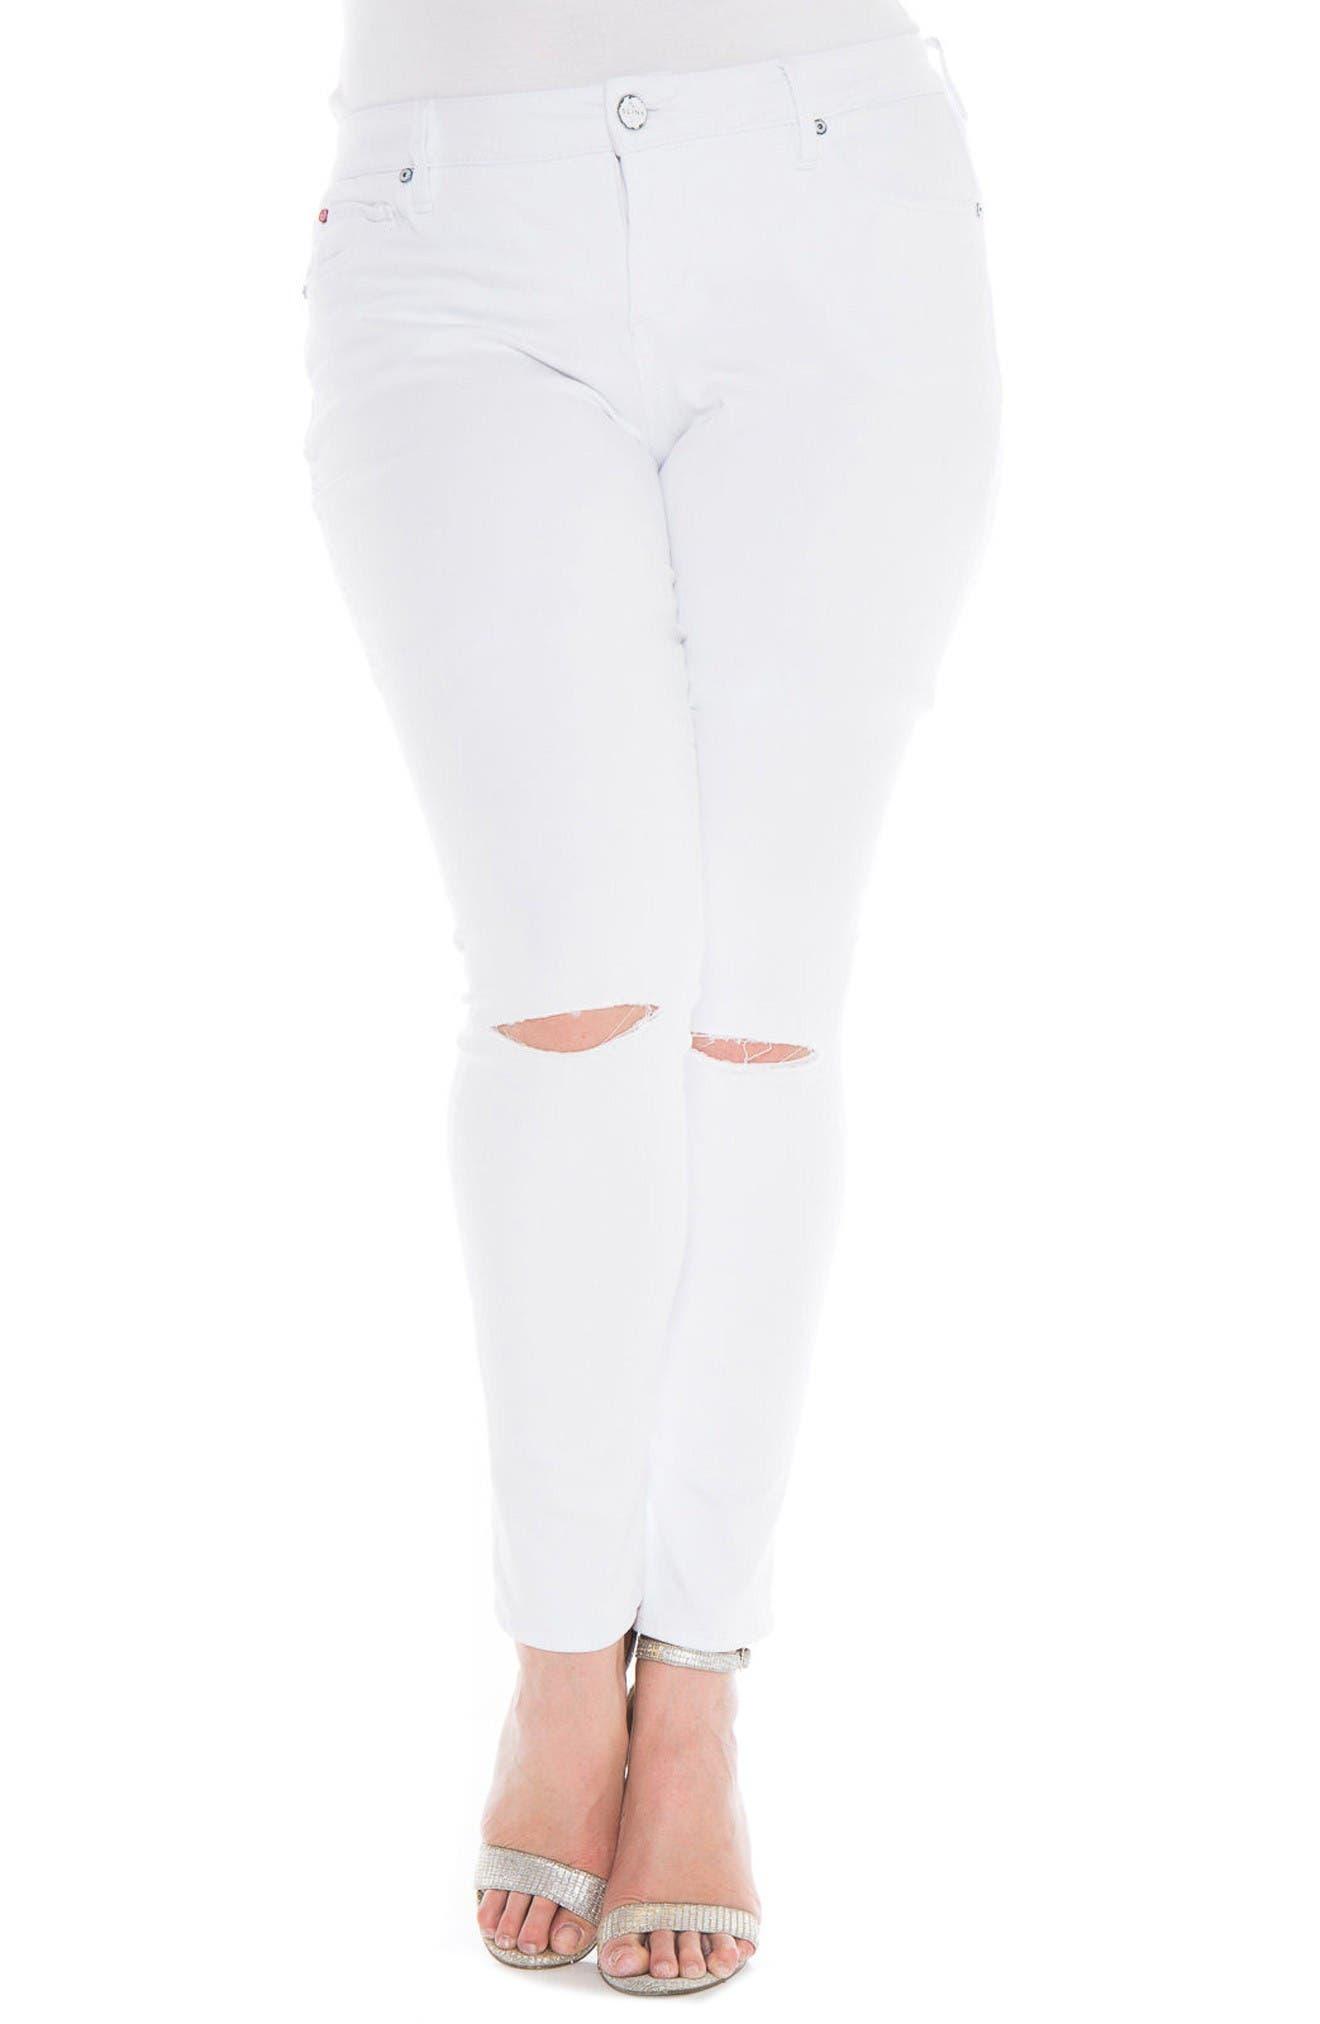 SLINK Jeans Slit Knee Skinny Jeans (Lexy) (Plus Size)